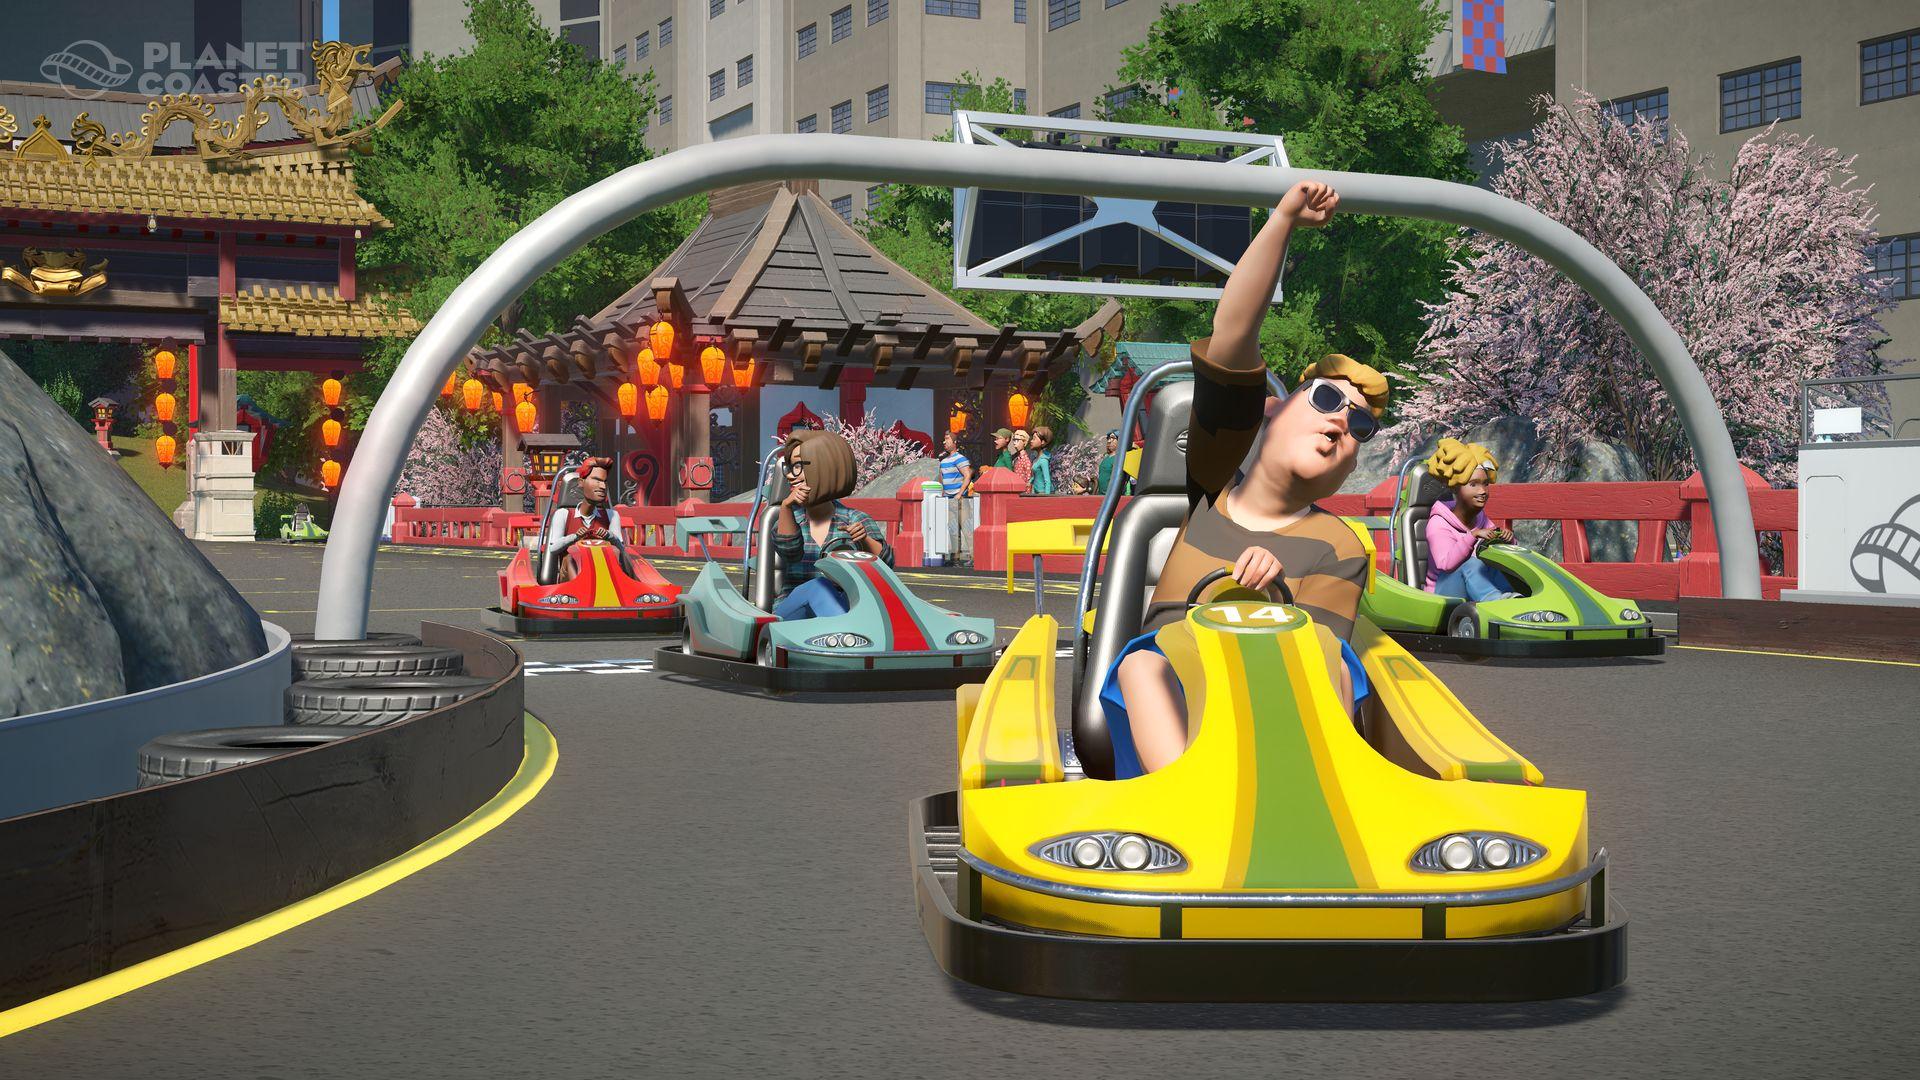 Planet Coaster: Console Edition confirma su llegada a Xbox Series X 3